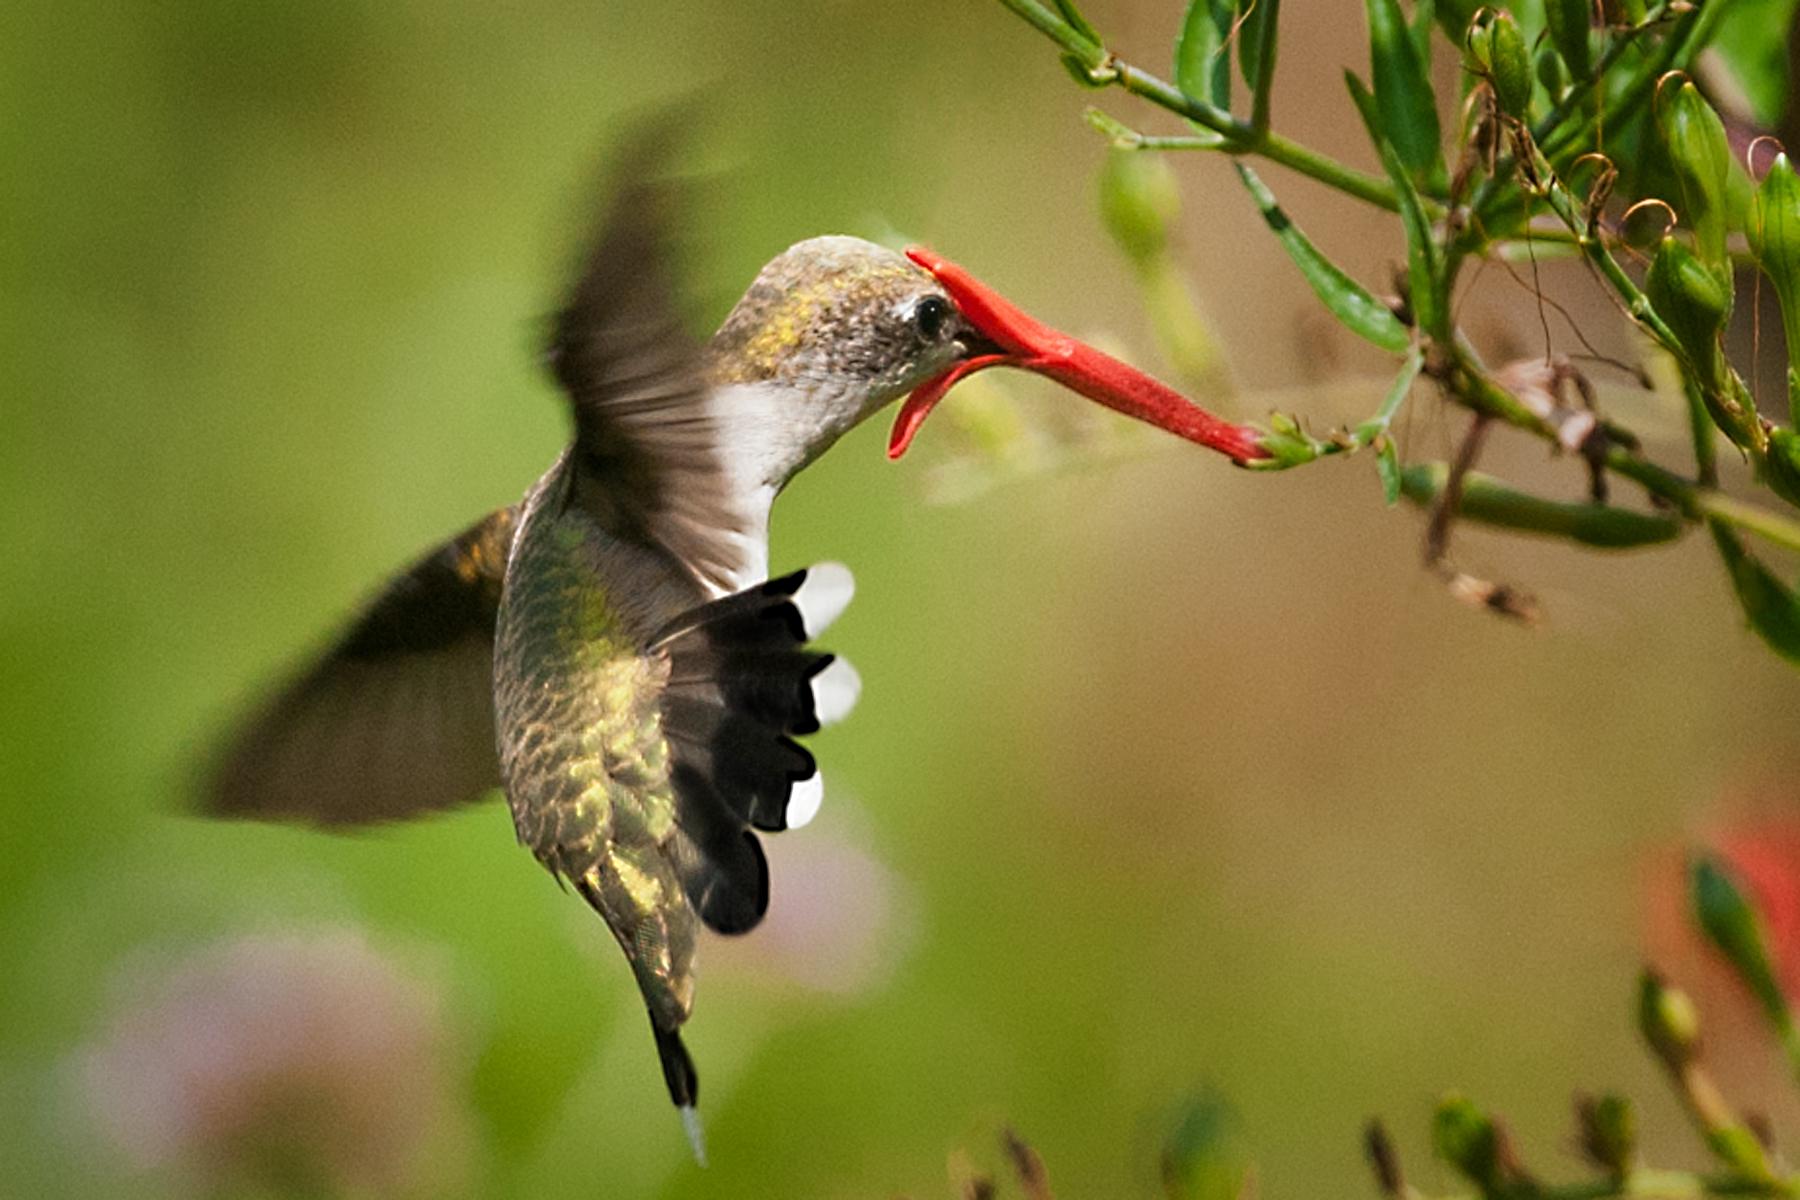 FemaleBlackChinnedHummingbird - DeniseRemfert.png